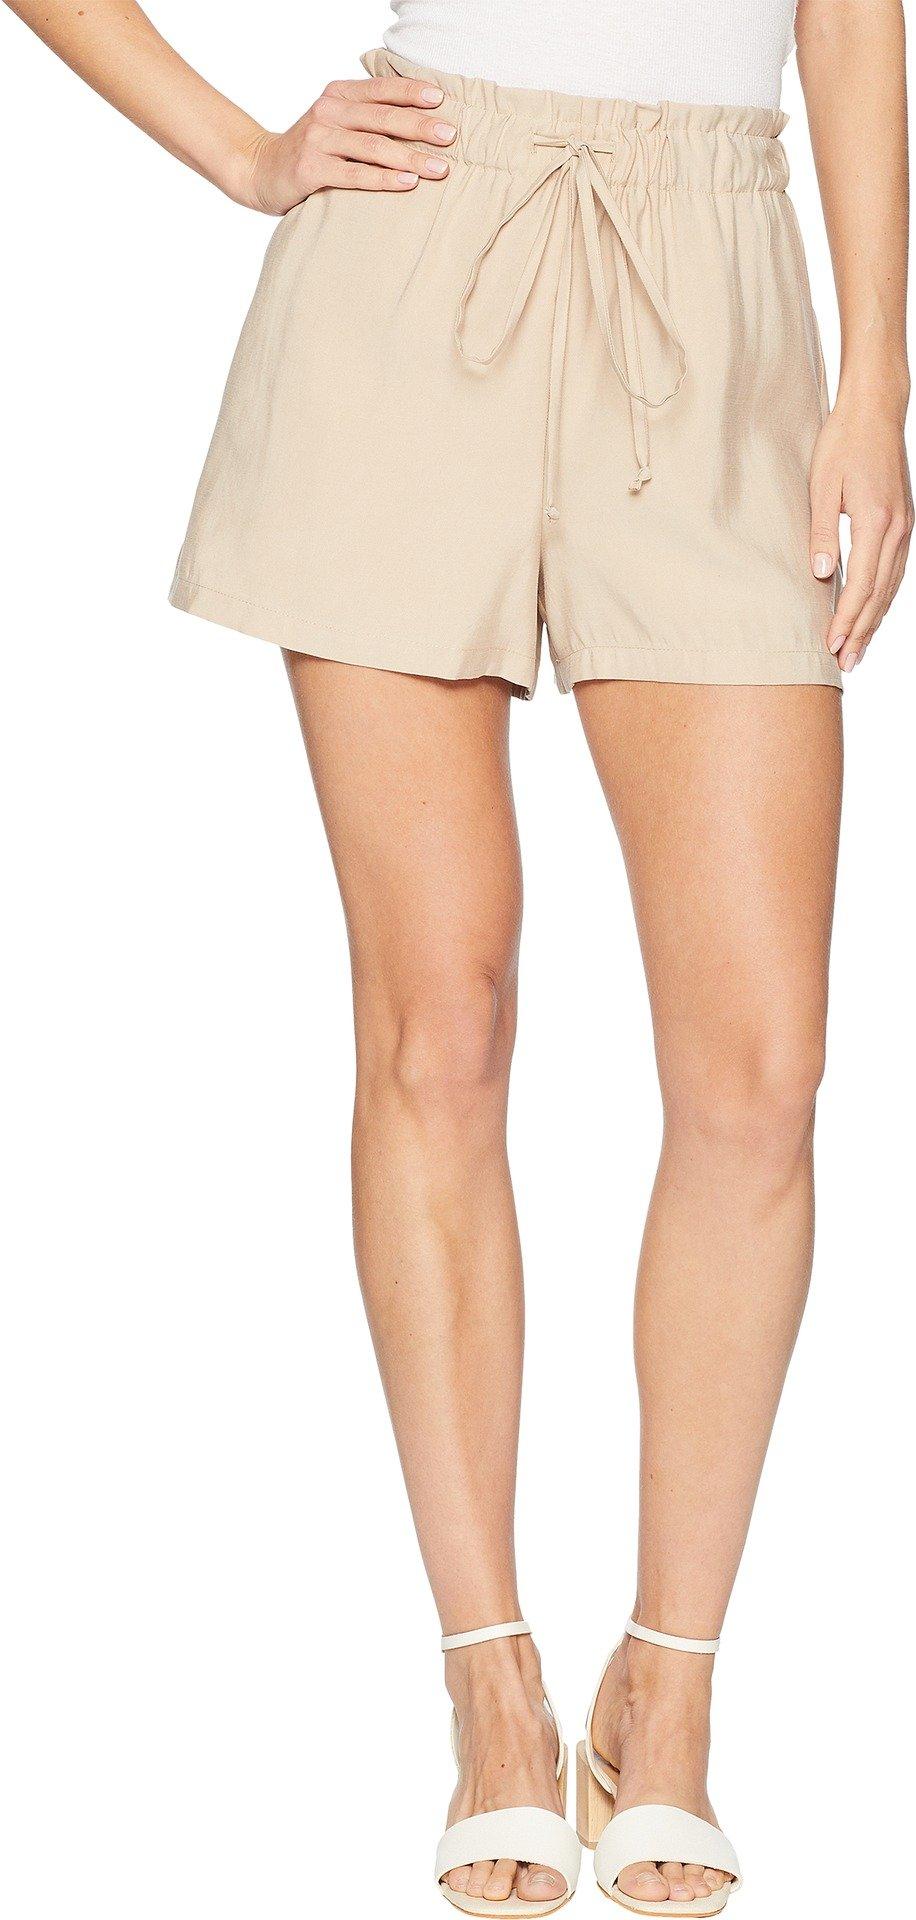 BCBGeneration Women's Paper Bag Short, Sand, XS